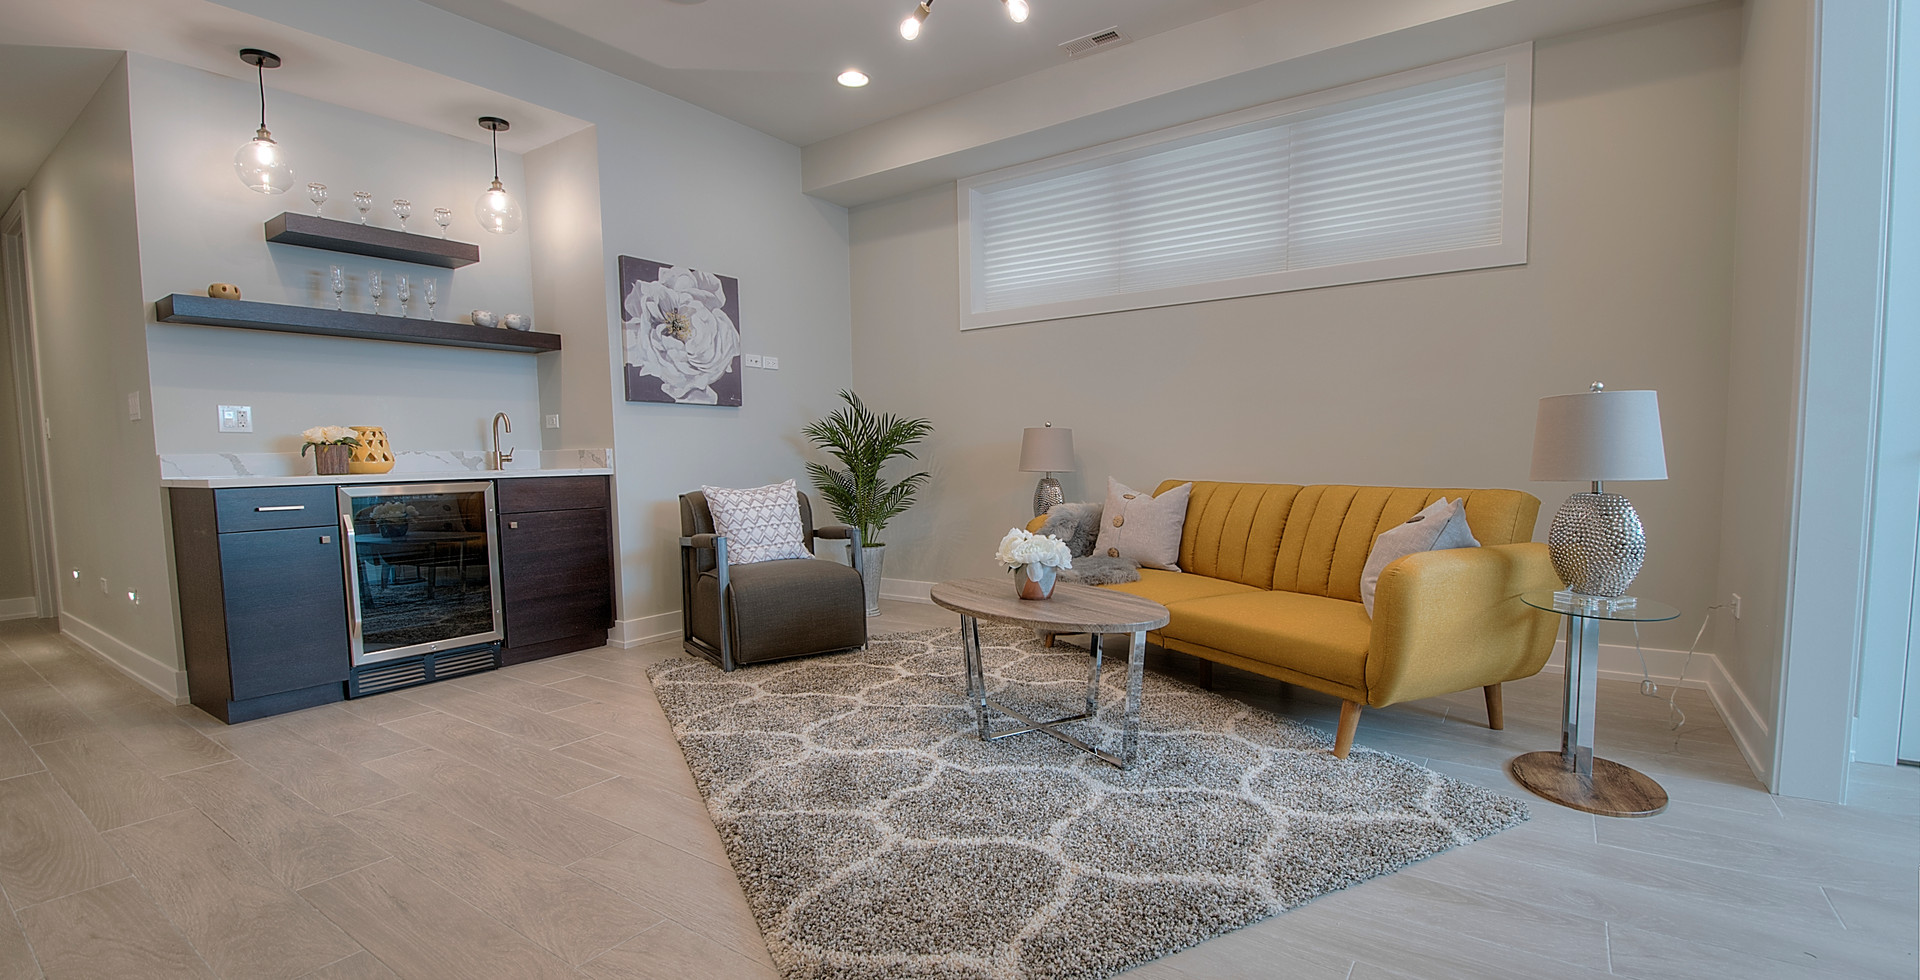 Living Room in La Grange designed by MRM Home Design.jpg